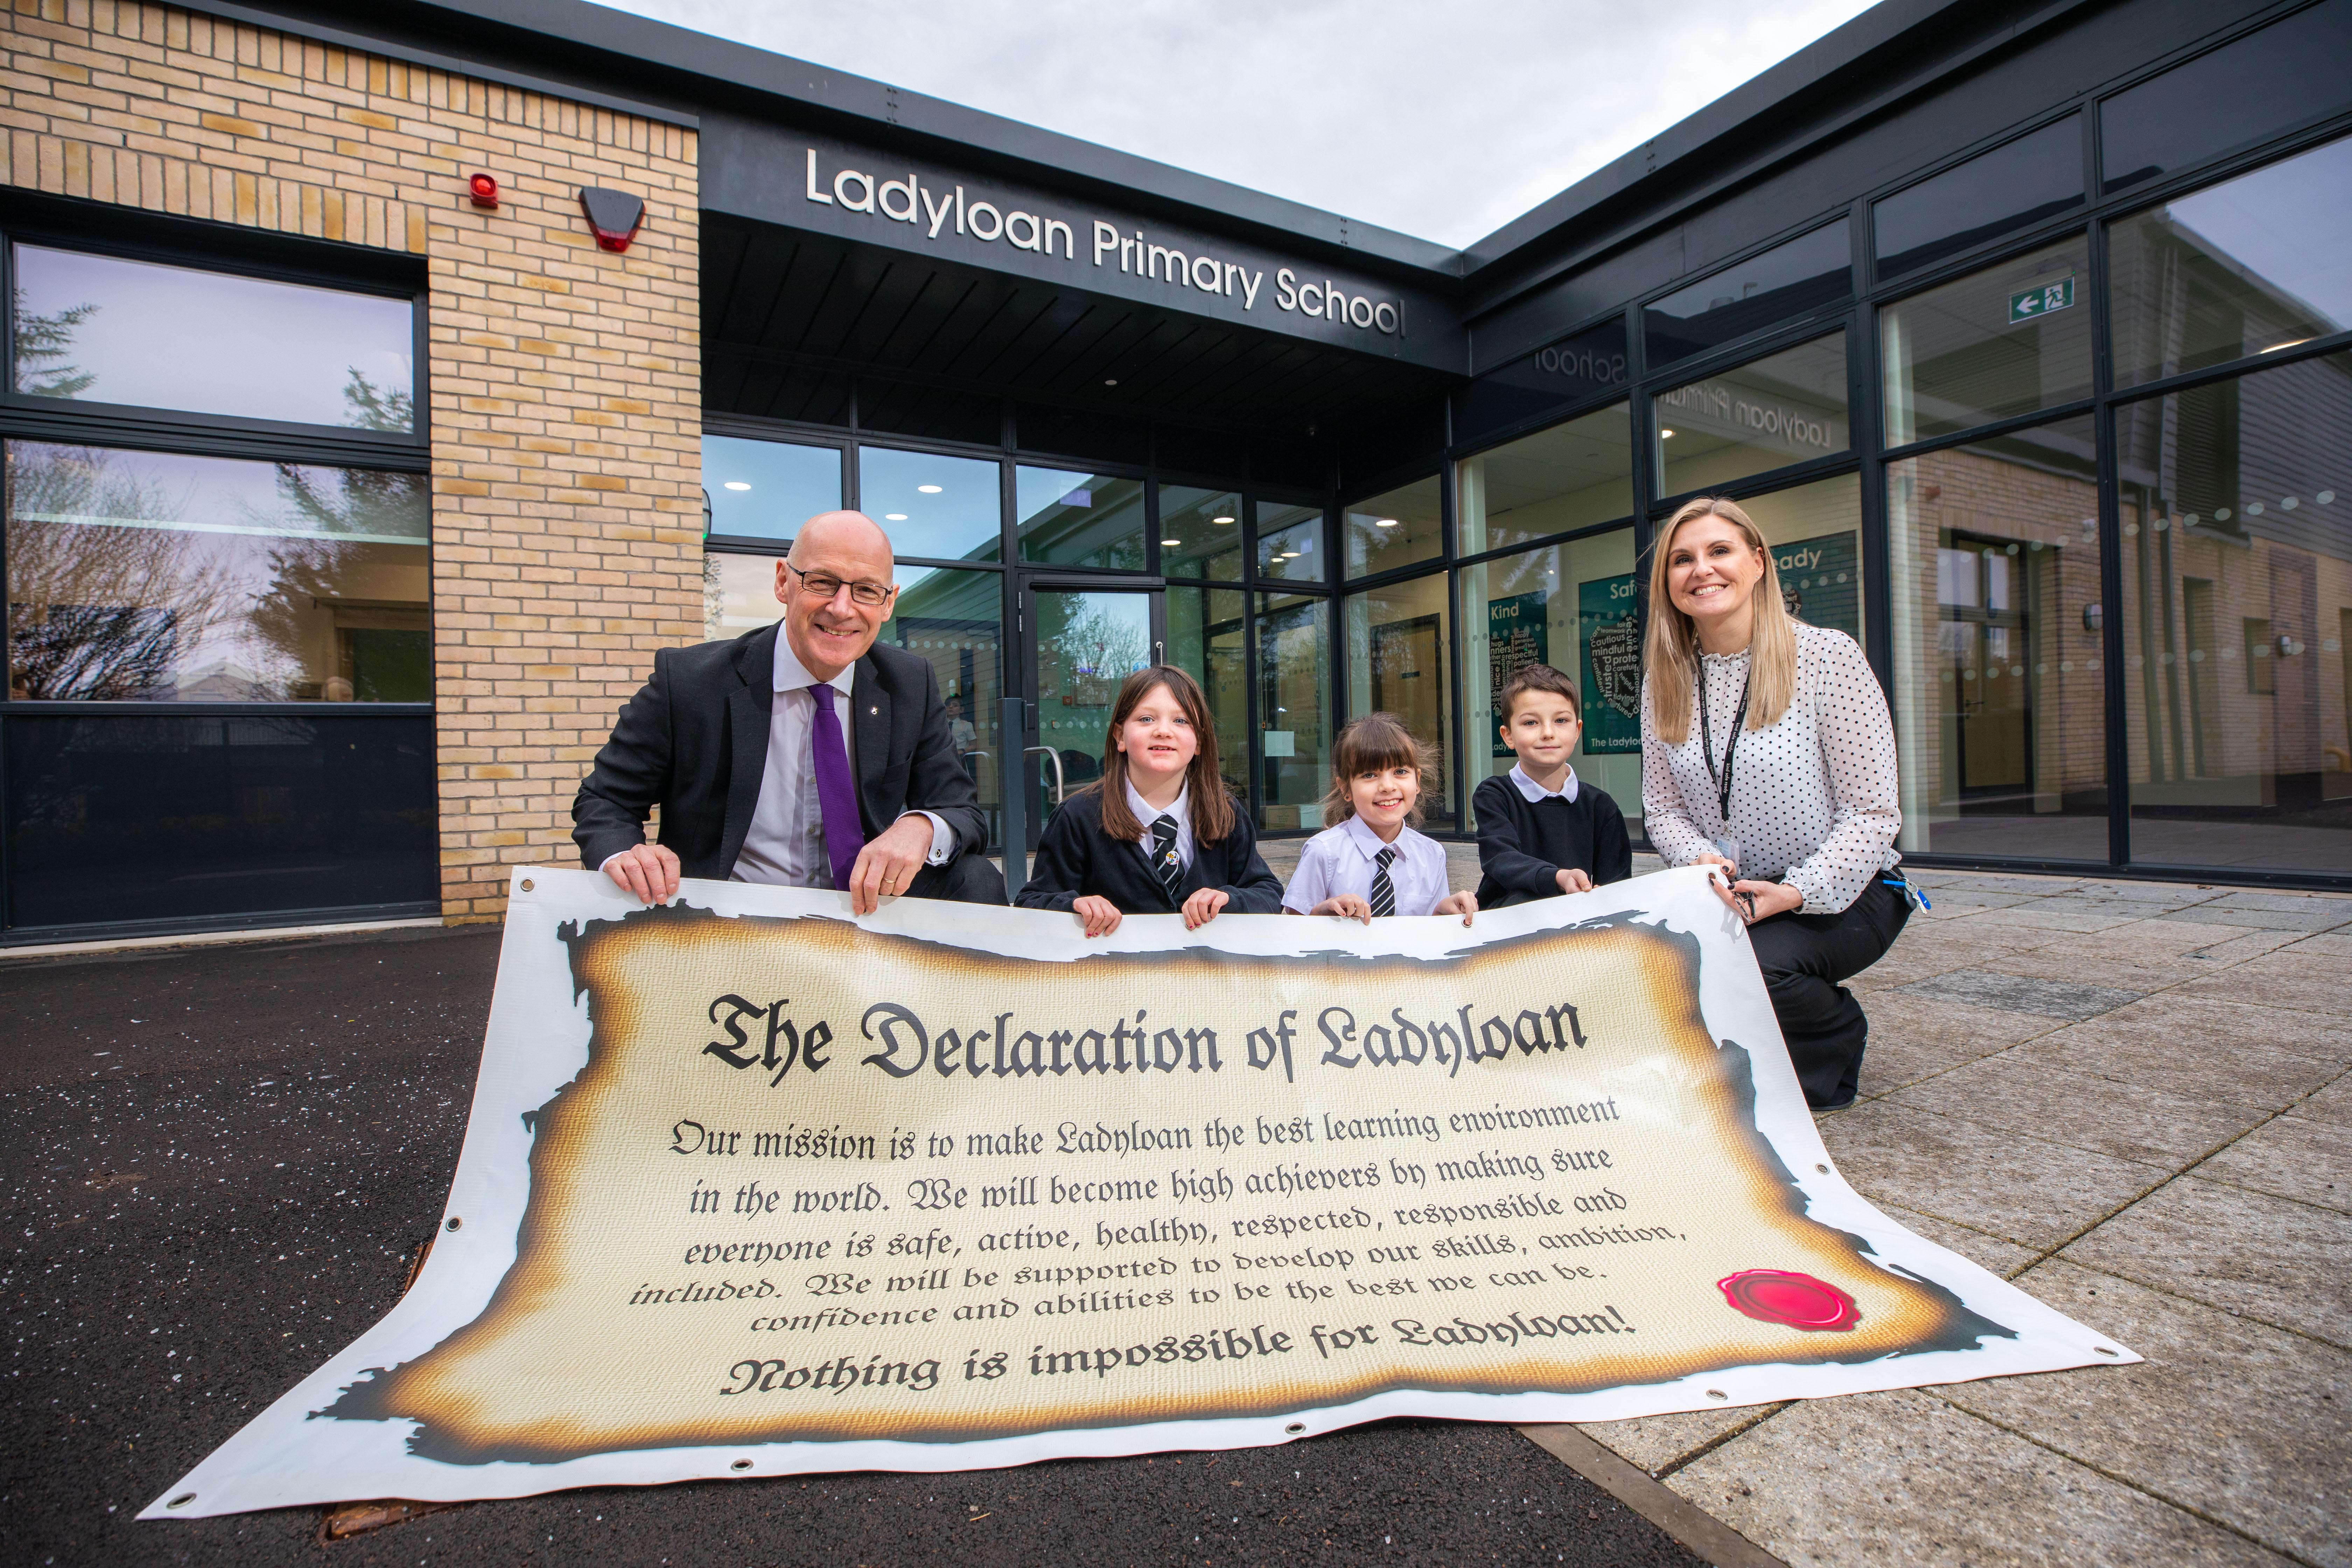 John Swinney MSP, Eva Dissel (Primary 4), Imogen Hawkins (Primary 4), Ollie Franks (Primary 5) and Jill Davie (Head Teacher Ladyloan Primary School).